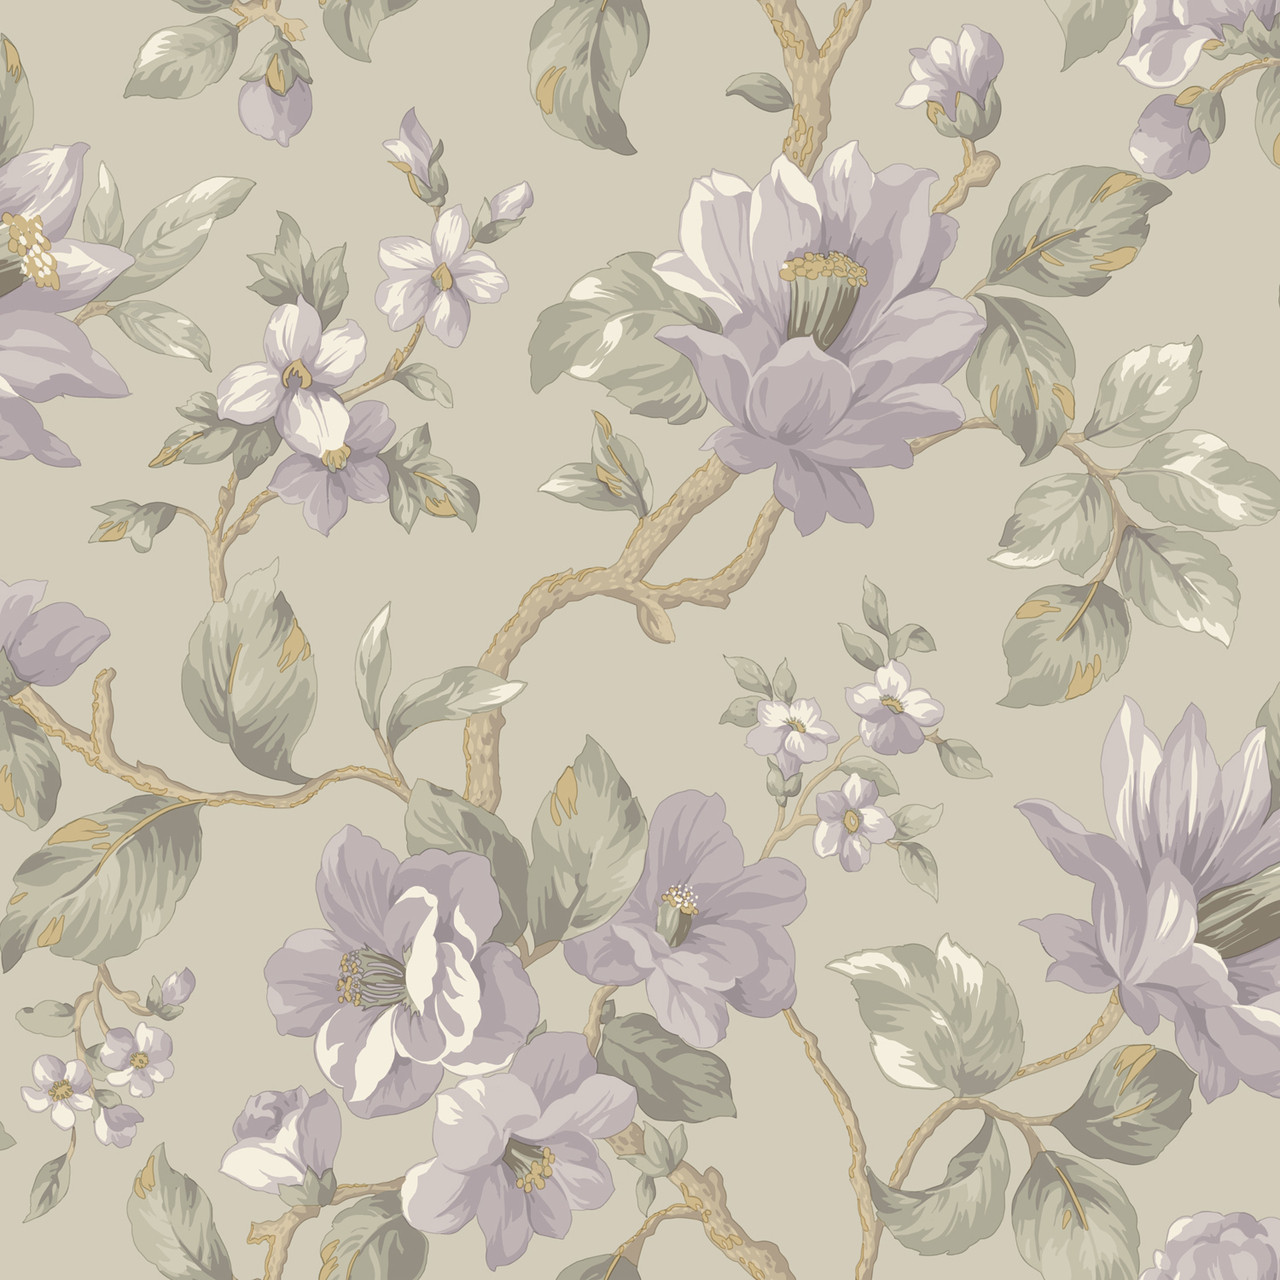 Al13723 Berkin Grey Large Floral Vine Wallpaper